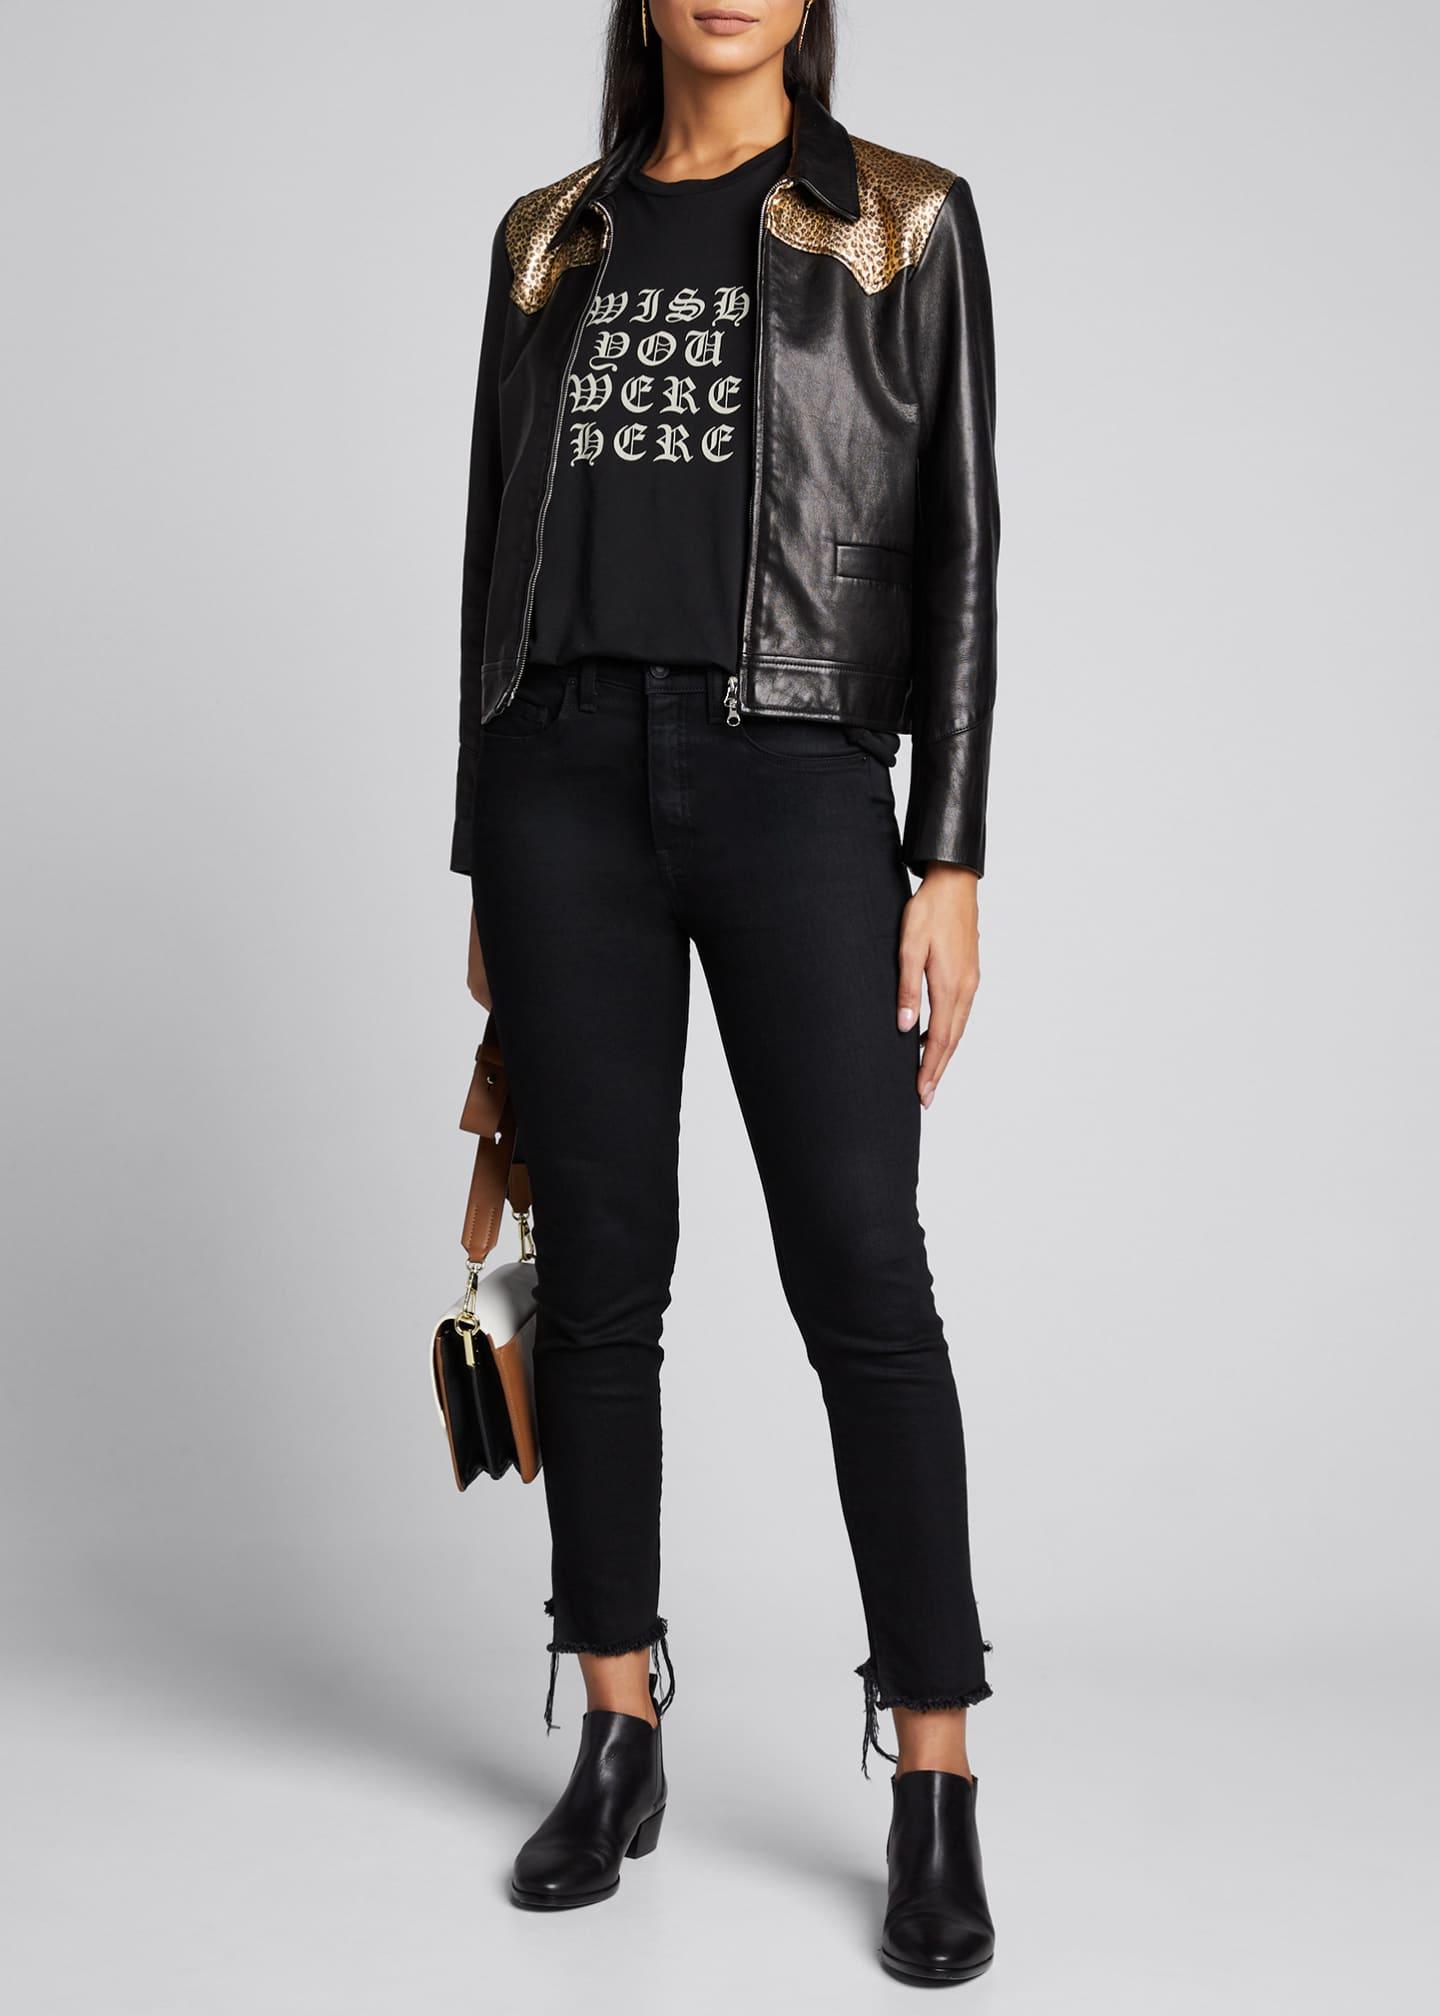 Nili Lotan Jaley Leopard-Print Leather Jacket